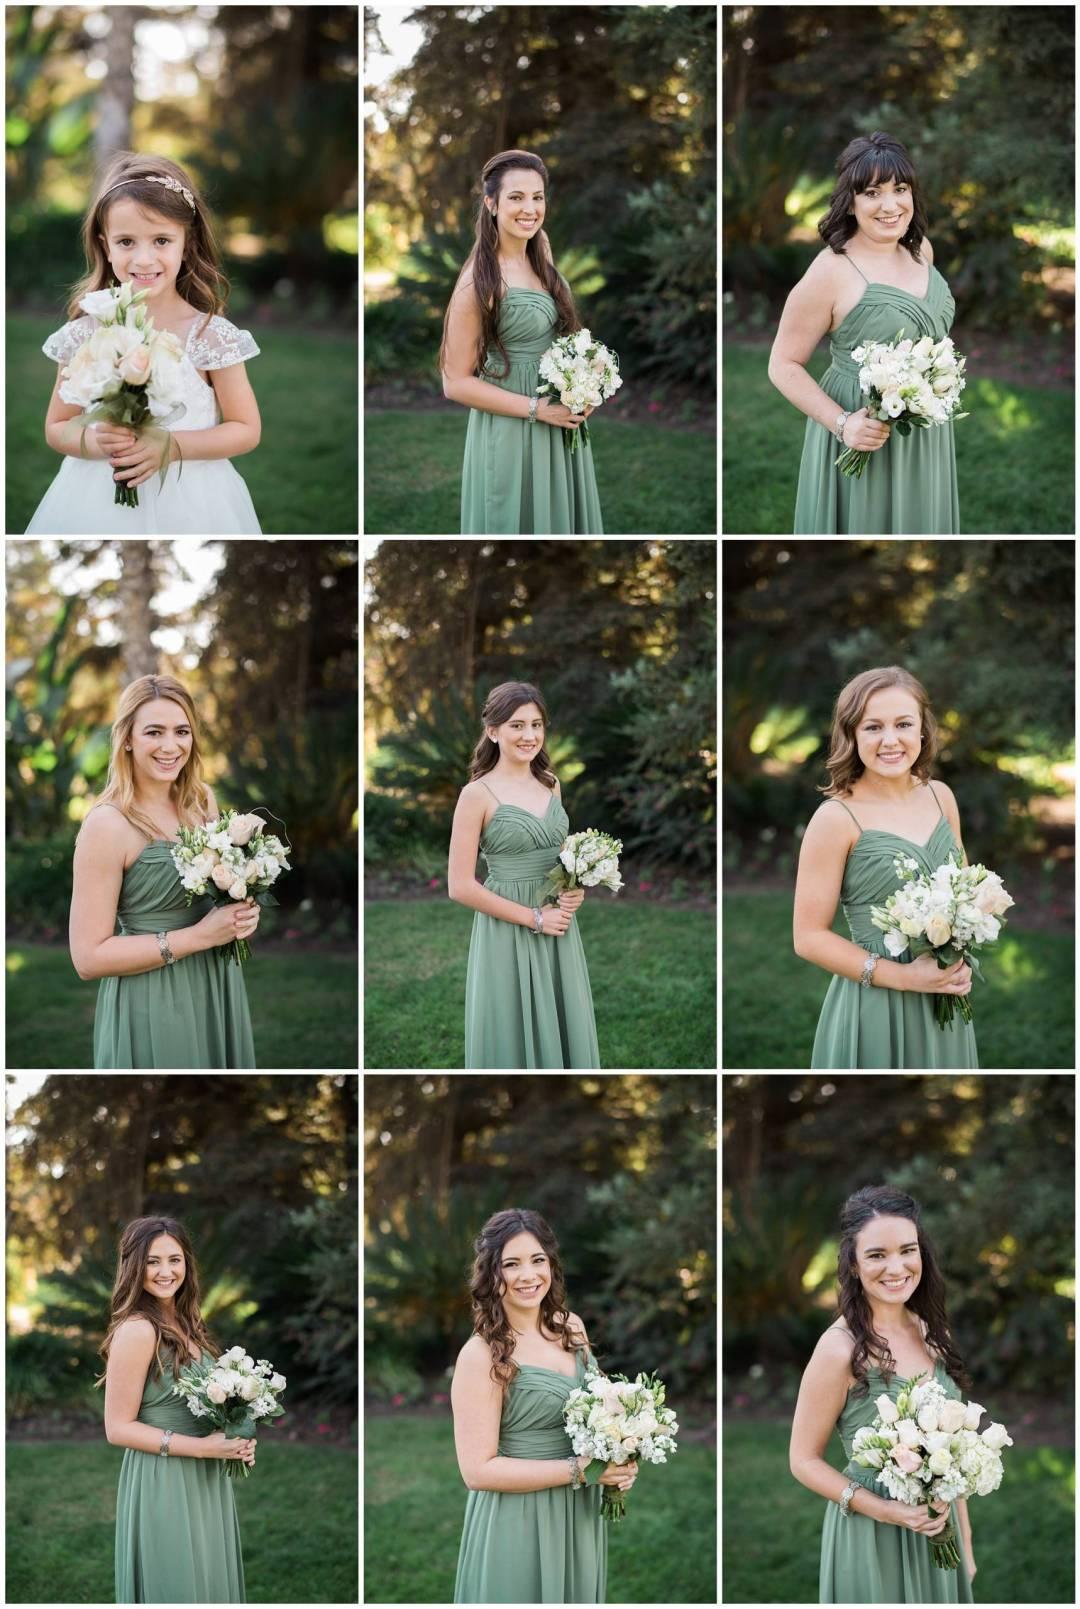 Kelcie & Devin Wedding Third Element Photography & Cinema Koetsier Ranch Visalia Tulare Fresno Hybrid Film Wedding Photographer_0012